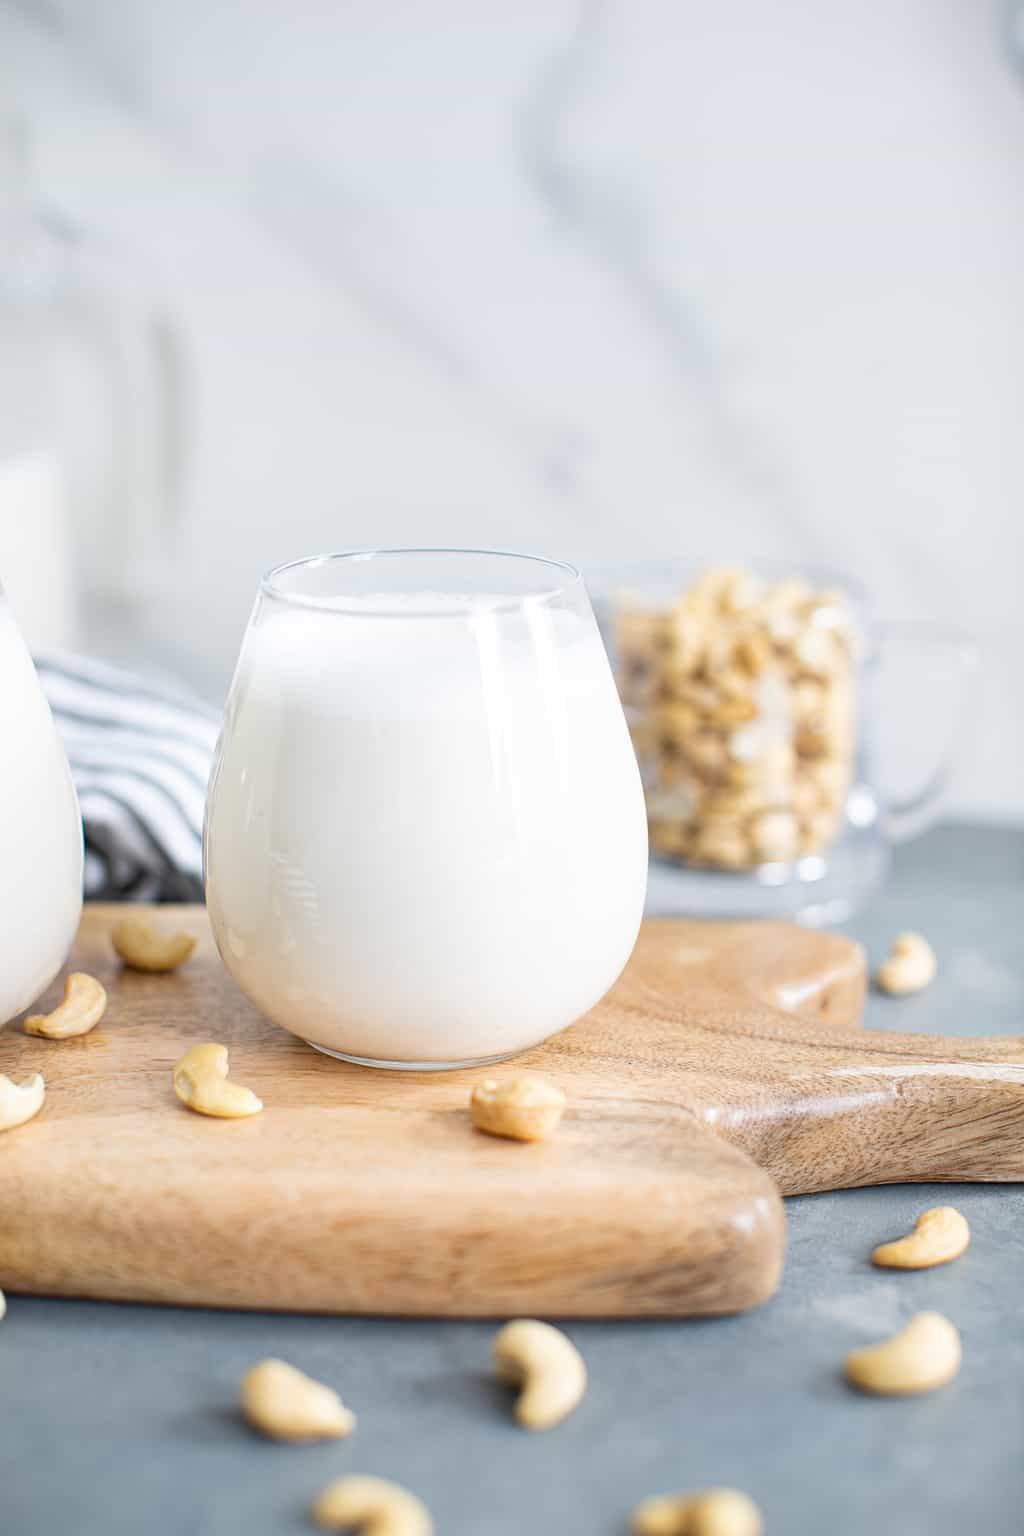 Easy Homemade Creamy Cashew Milk